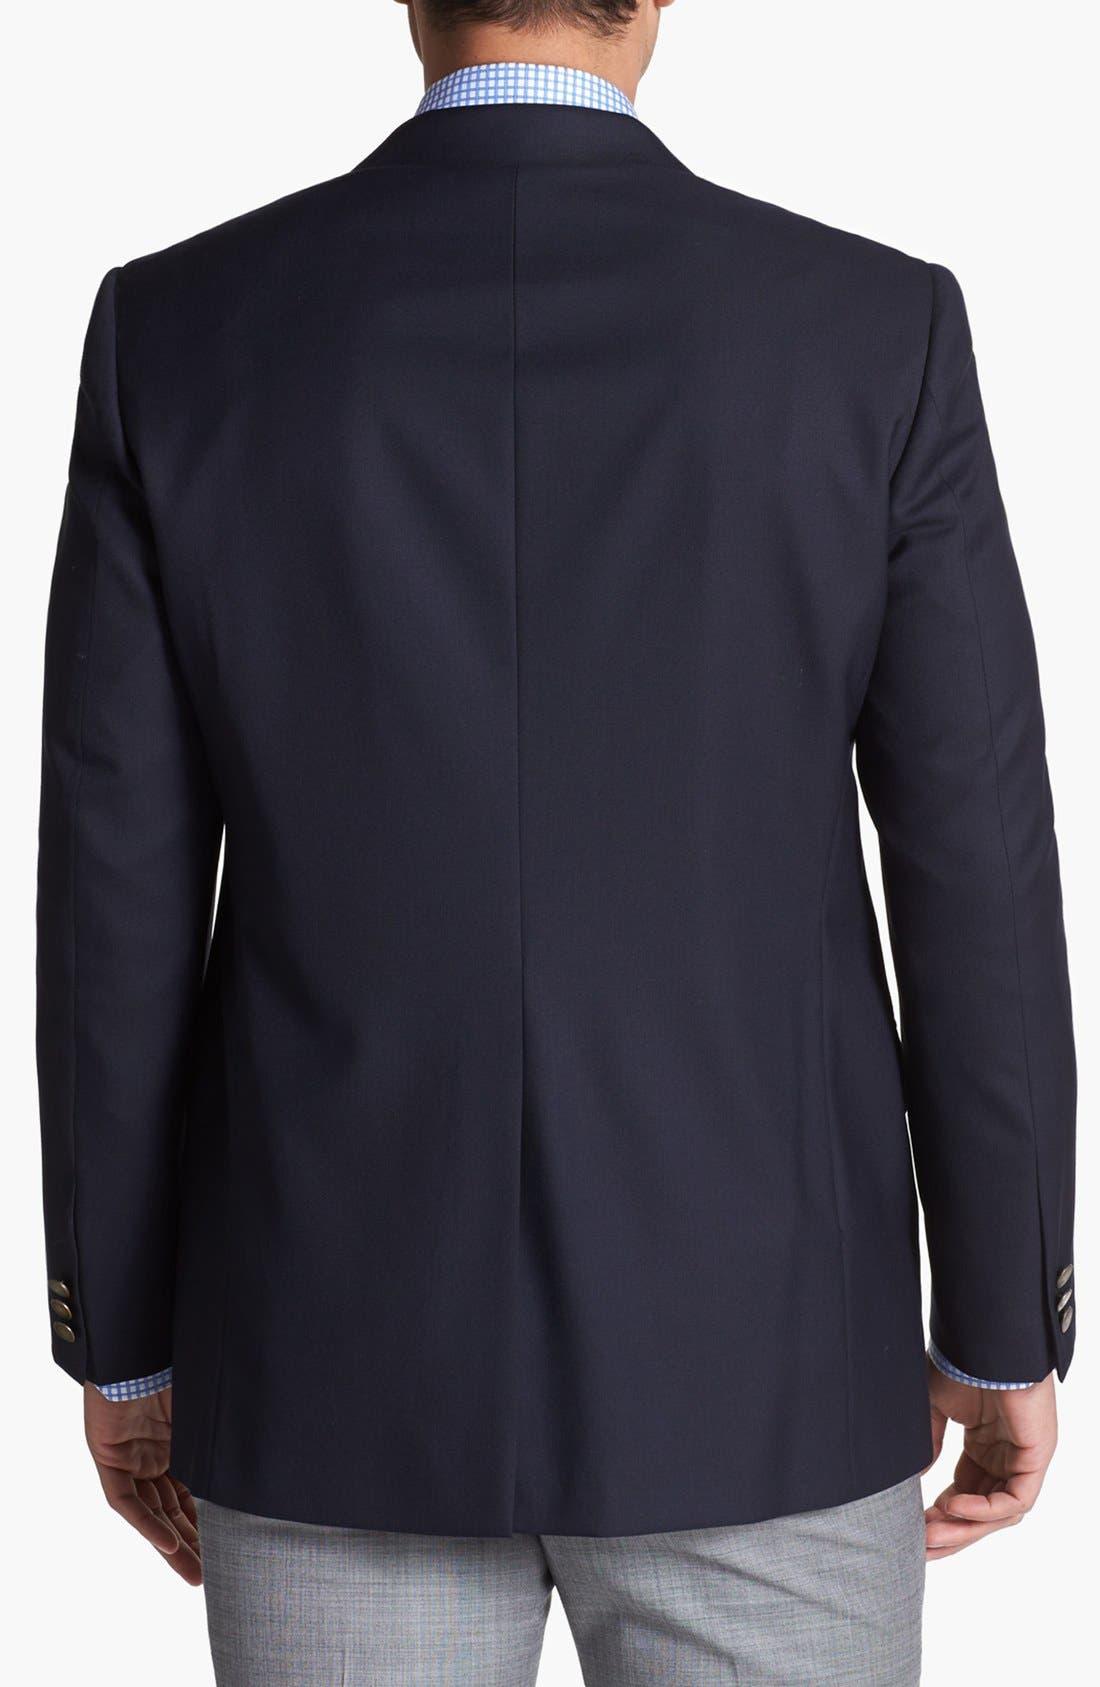 Navy Wool Blazer,                             Alternate thumbnail 2, color,                             Navy